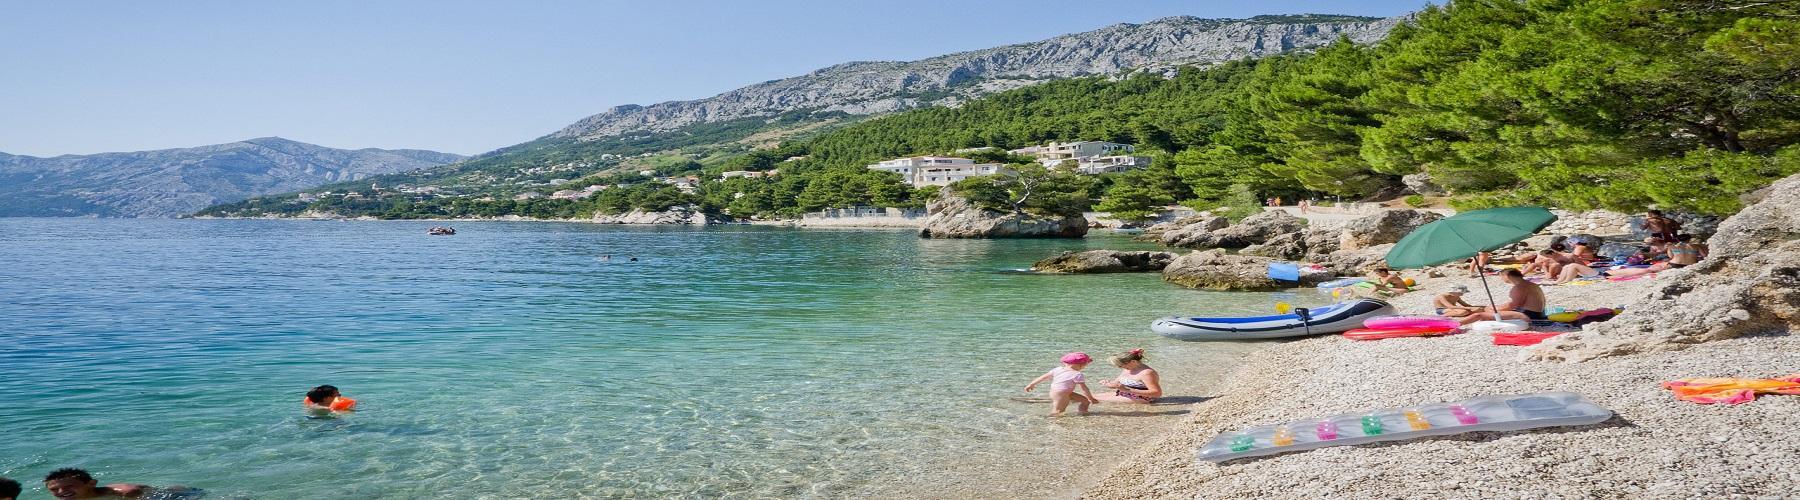 Пляжи в Хорватии Сплит